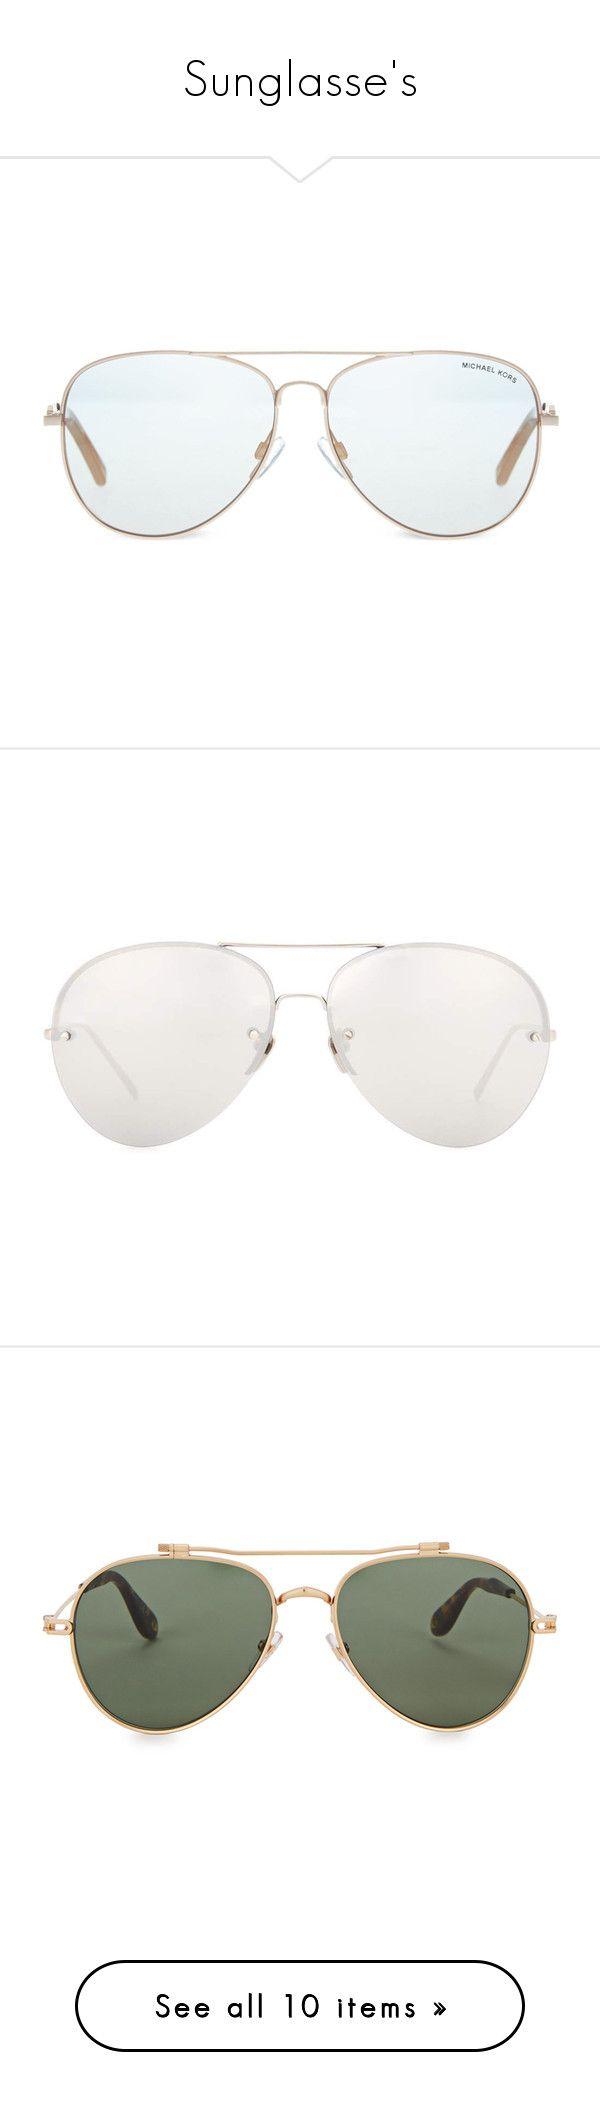 """Sunglasse's"" by briyannaelainhoy on Polyvore featuring accessories, eyewear, sunglasses, michael kors, aviator style glasses, wire sunglasses, michael kors aviators, lens glasses, glasses and white"